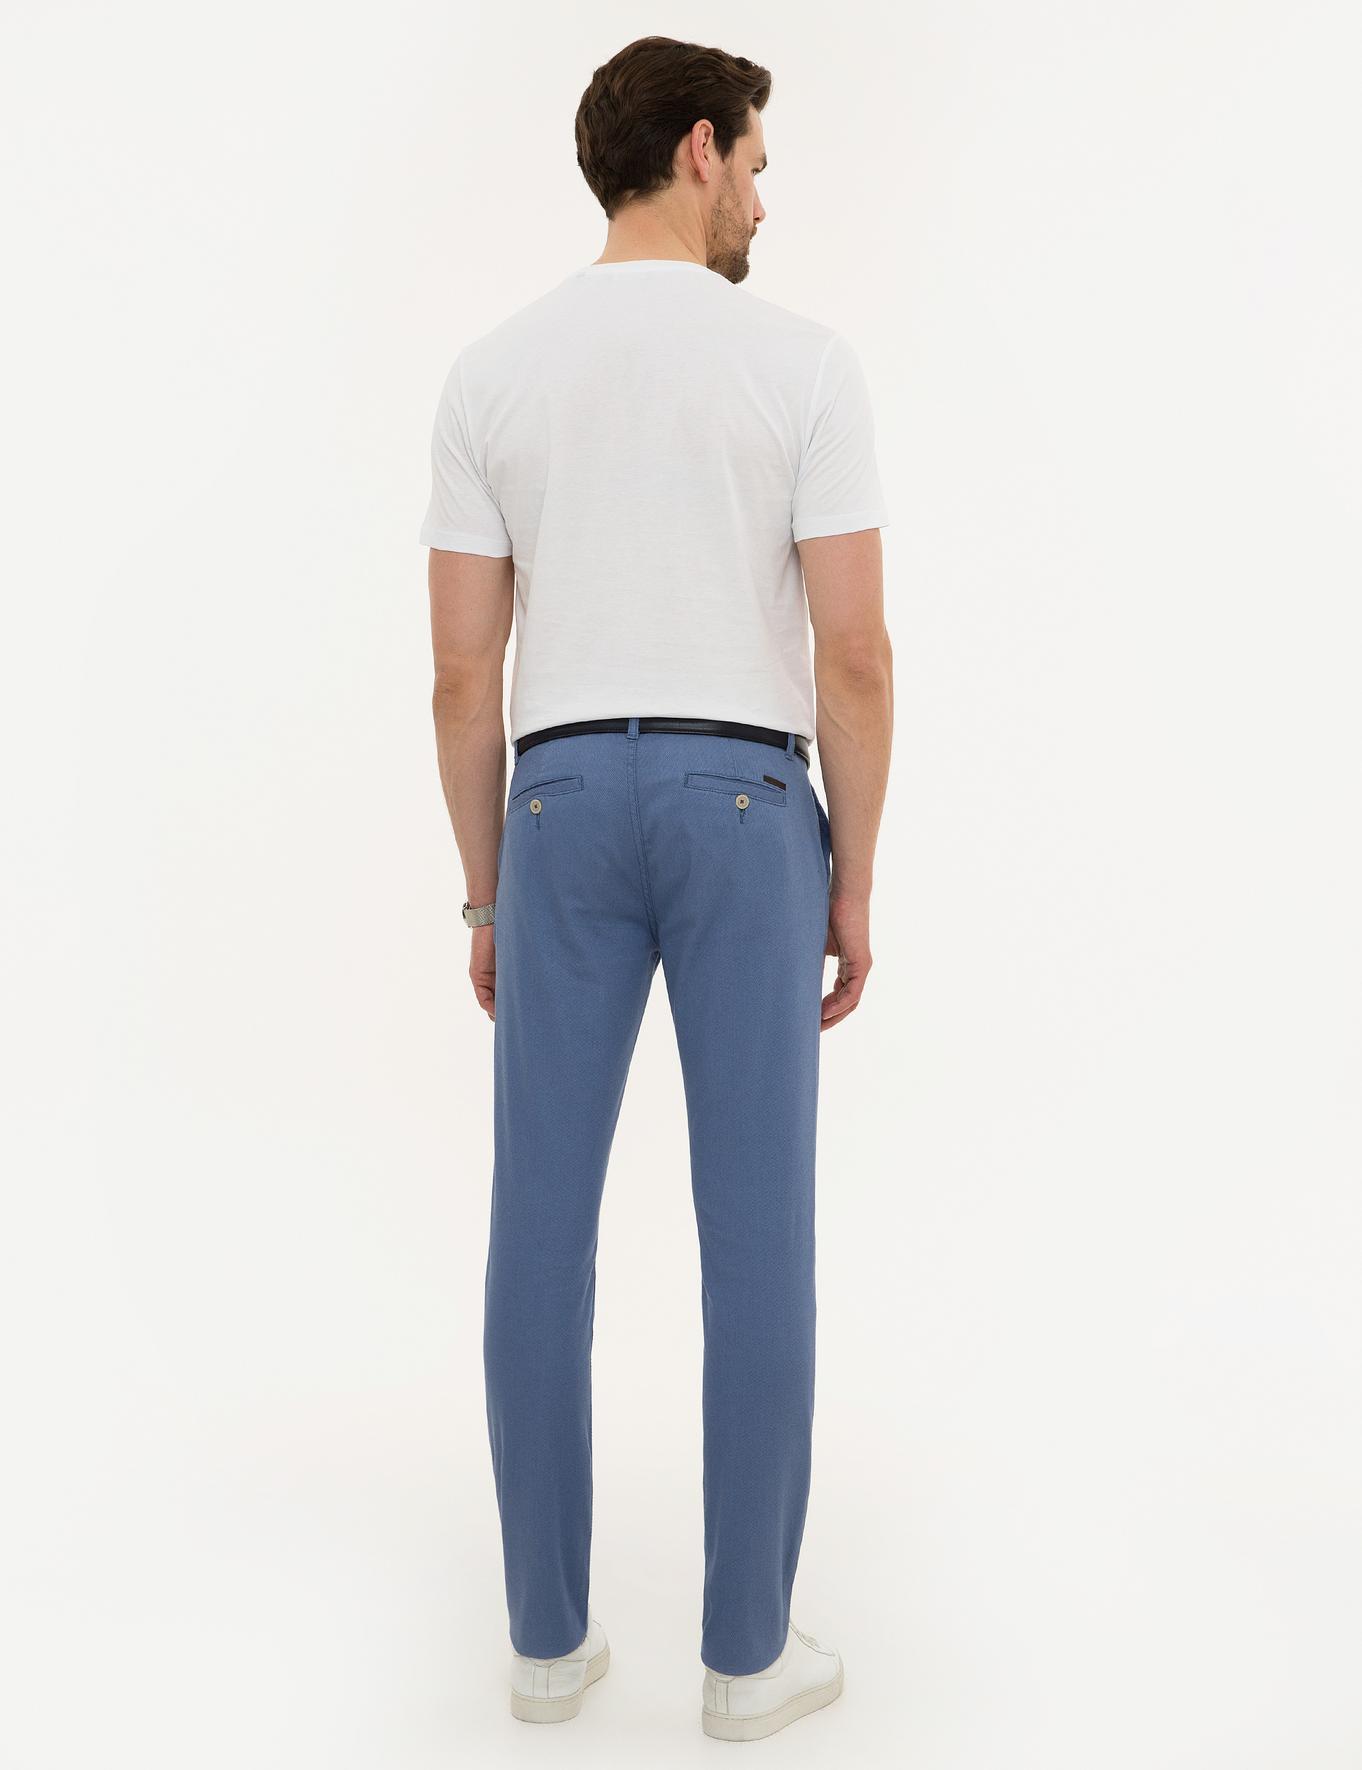 Mavi Slim Fit Chino Pantolon